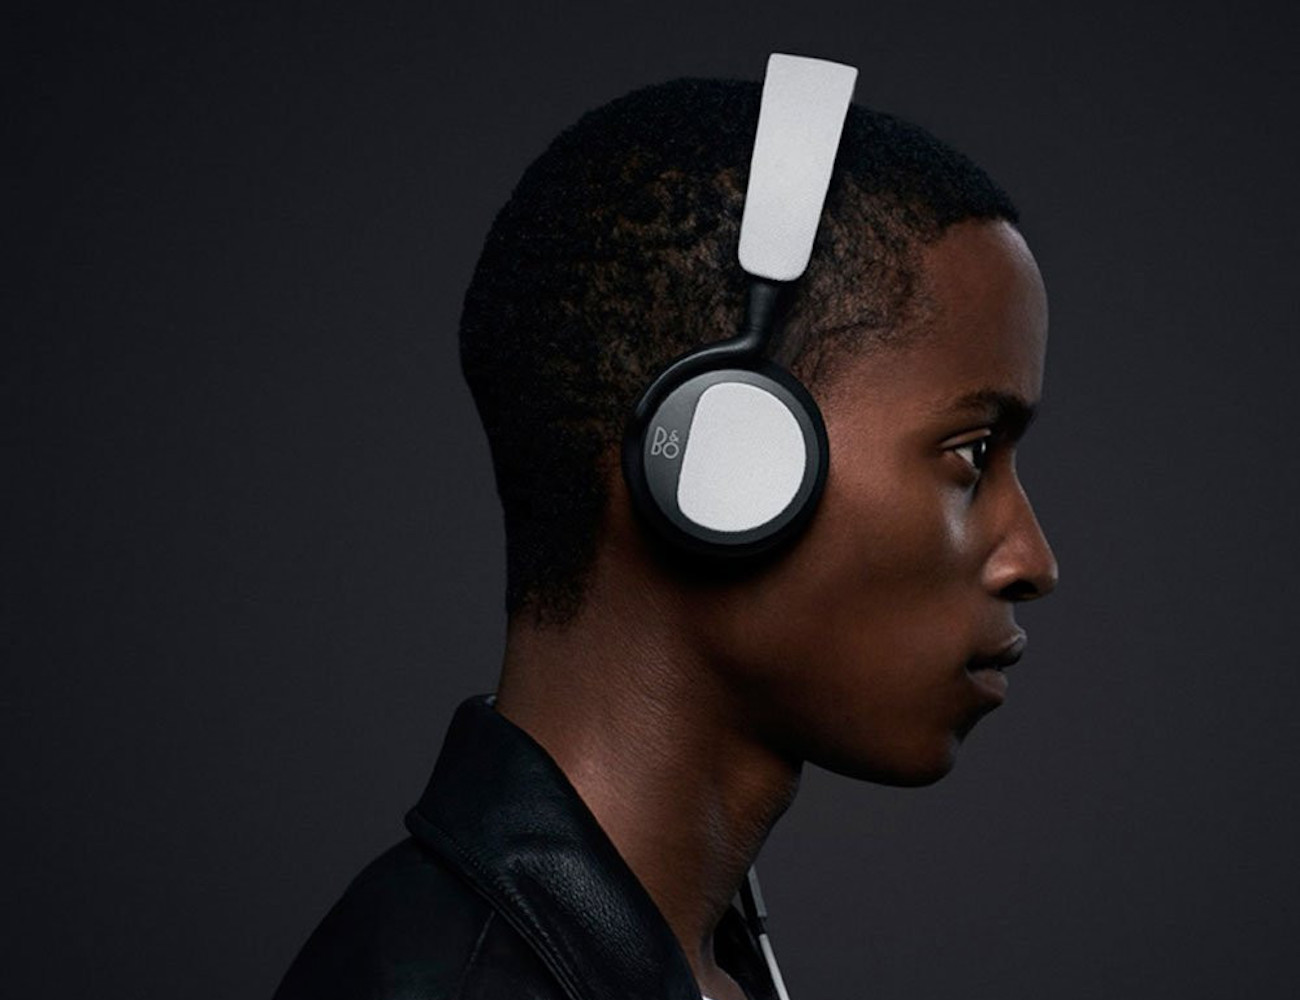 Bang & Olufsen H2 Headphones